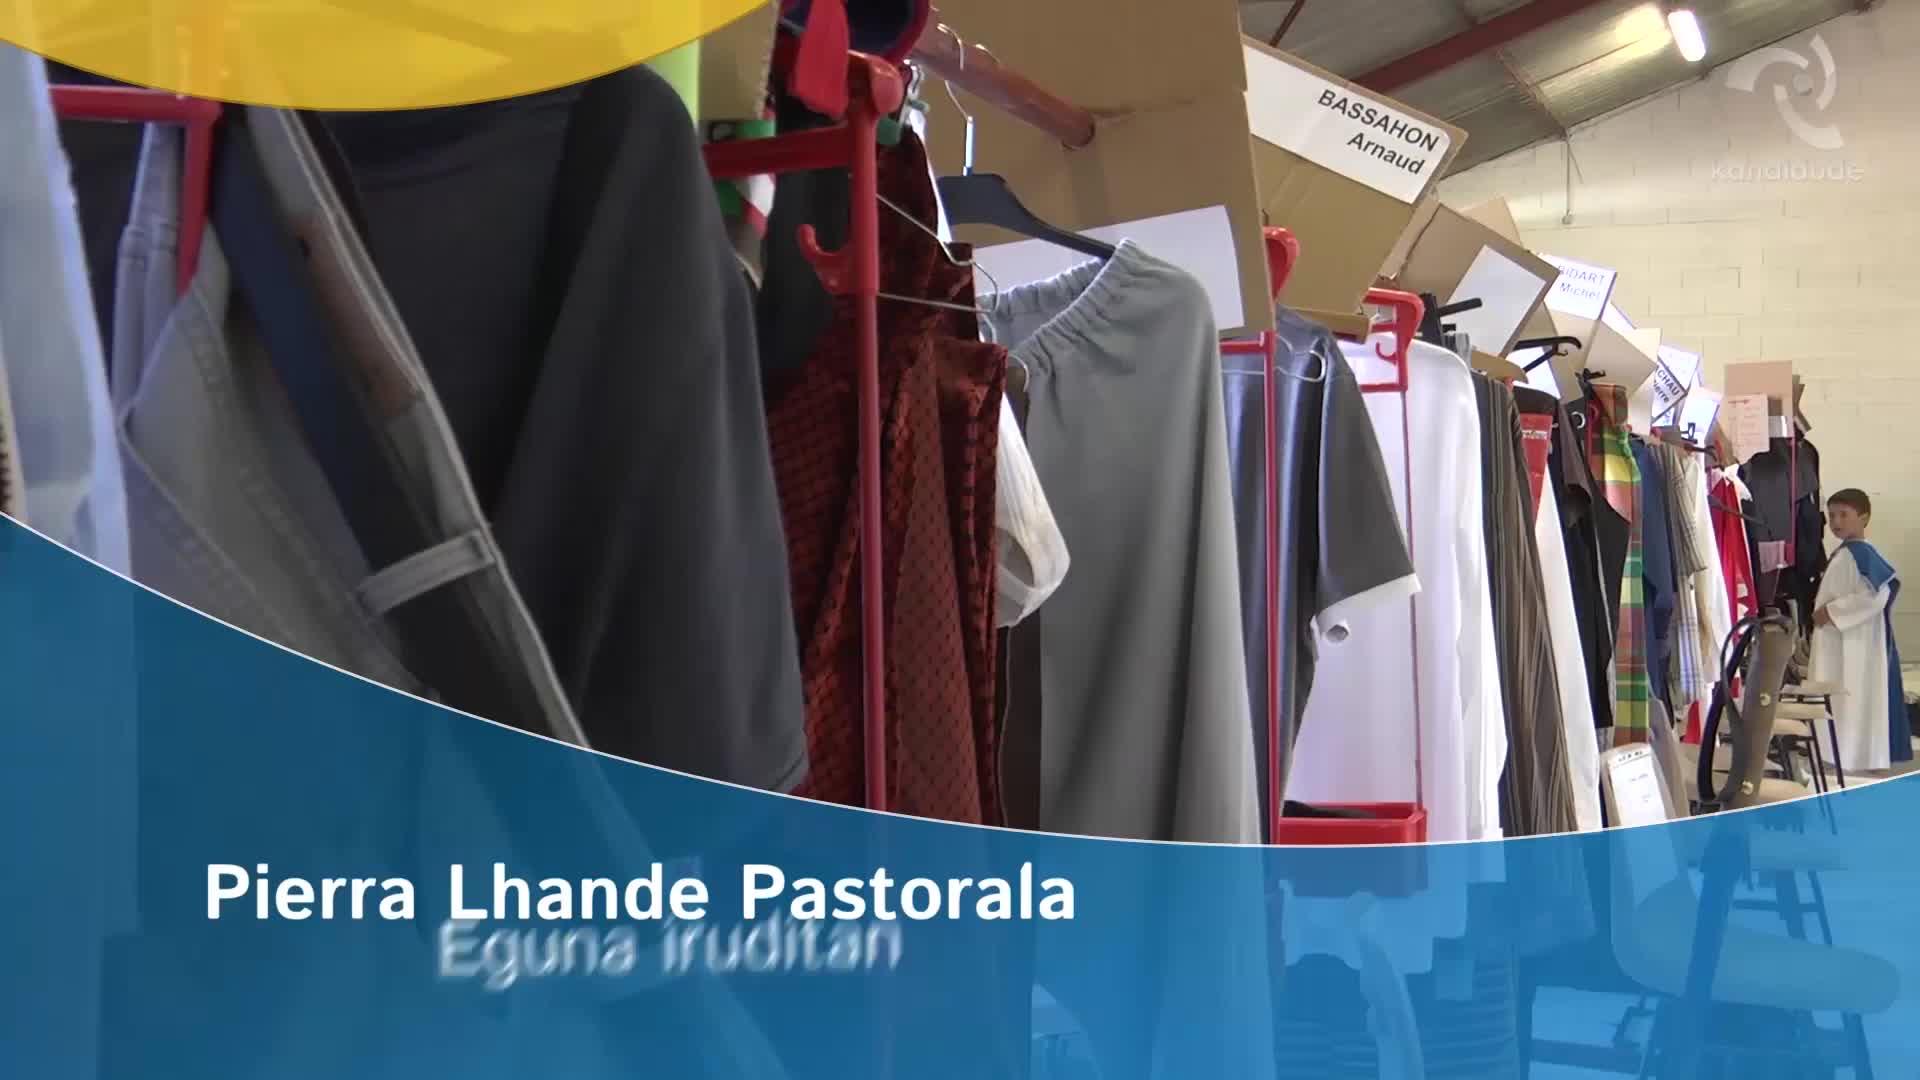 Pierra Lhande pastorala iruditan